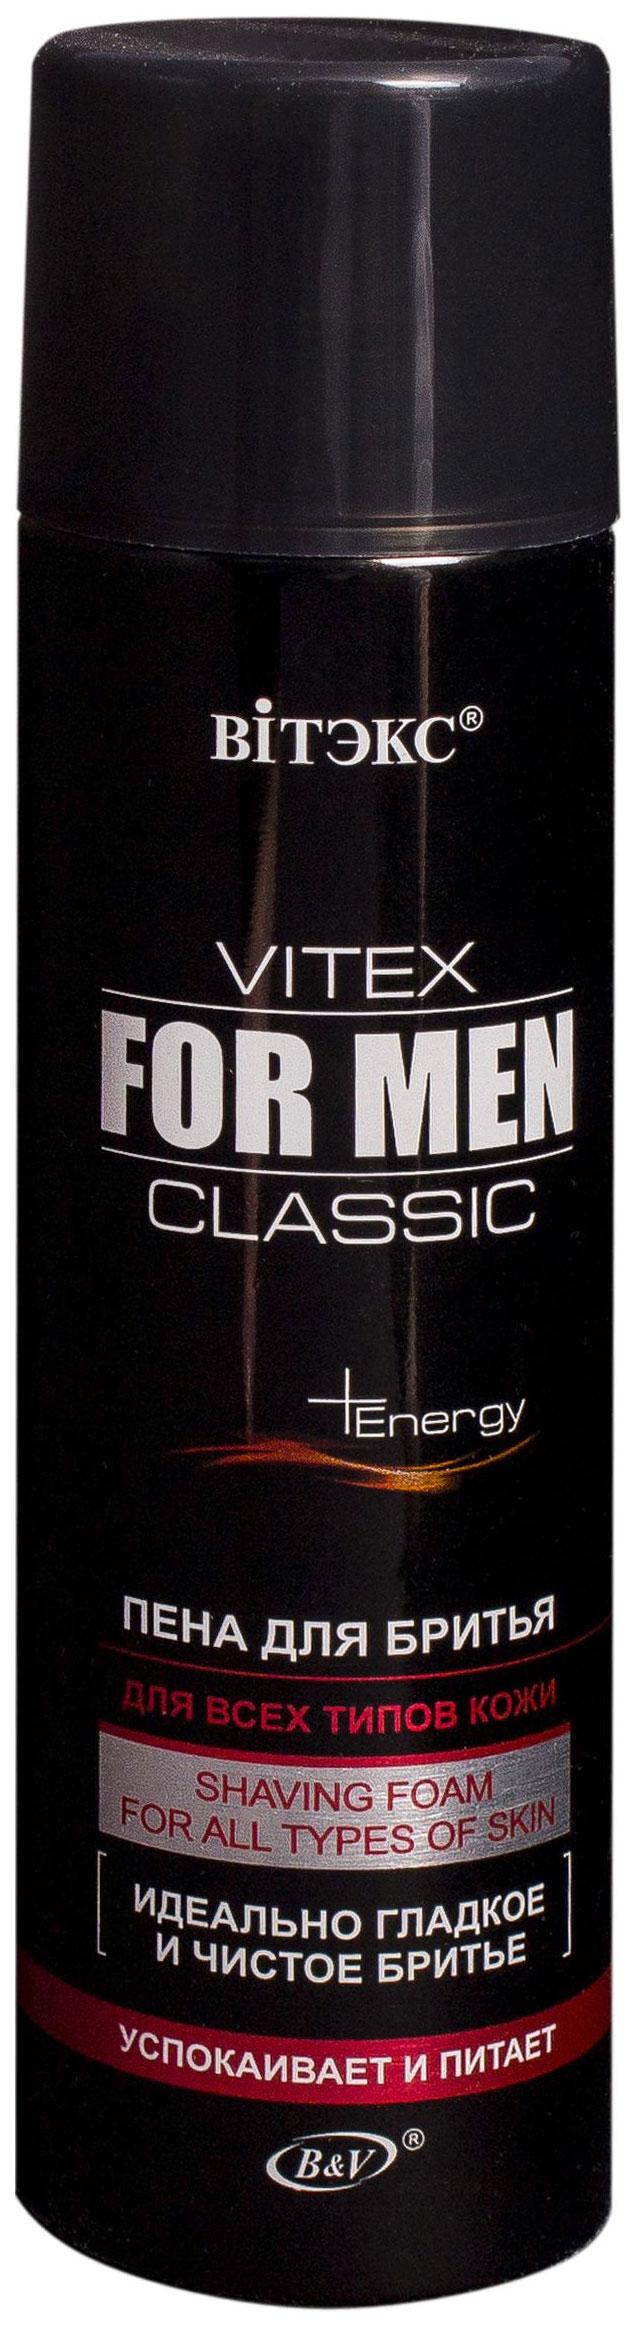 Пена для бритья Витэкс Vitex for men Classic